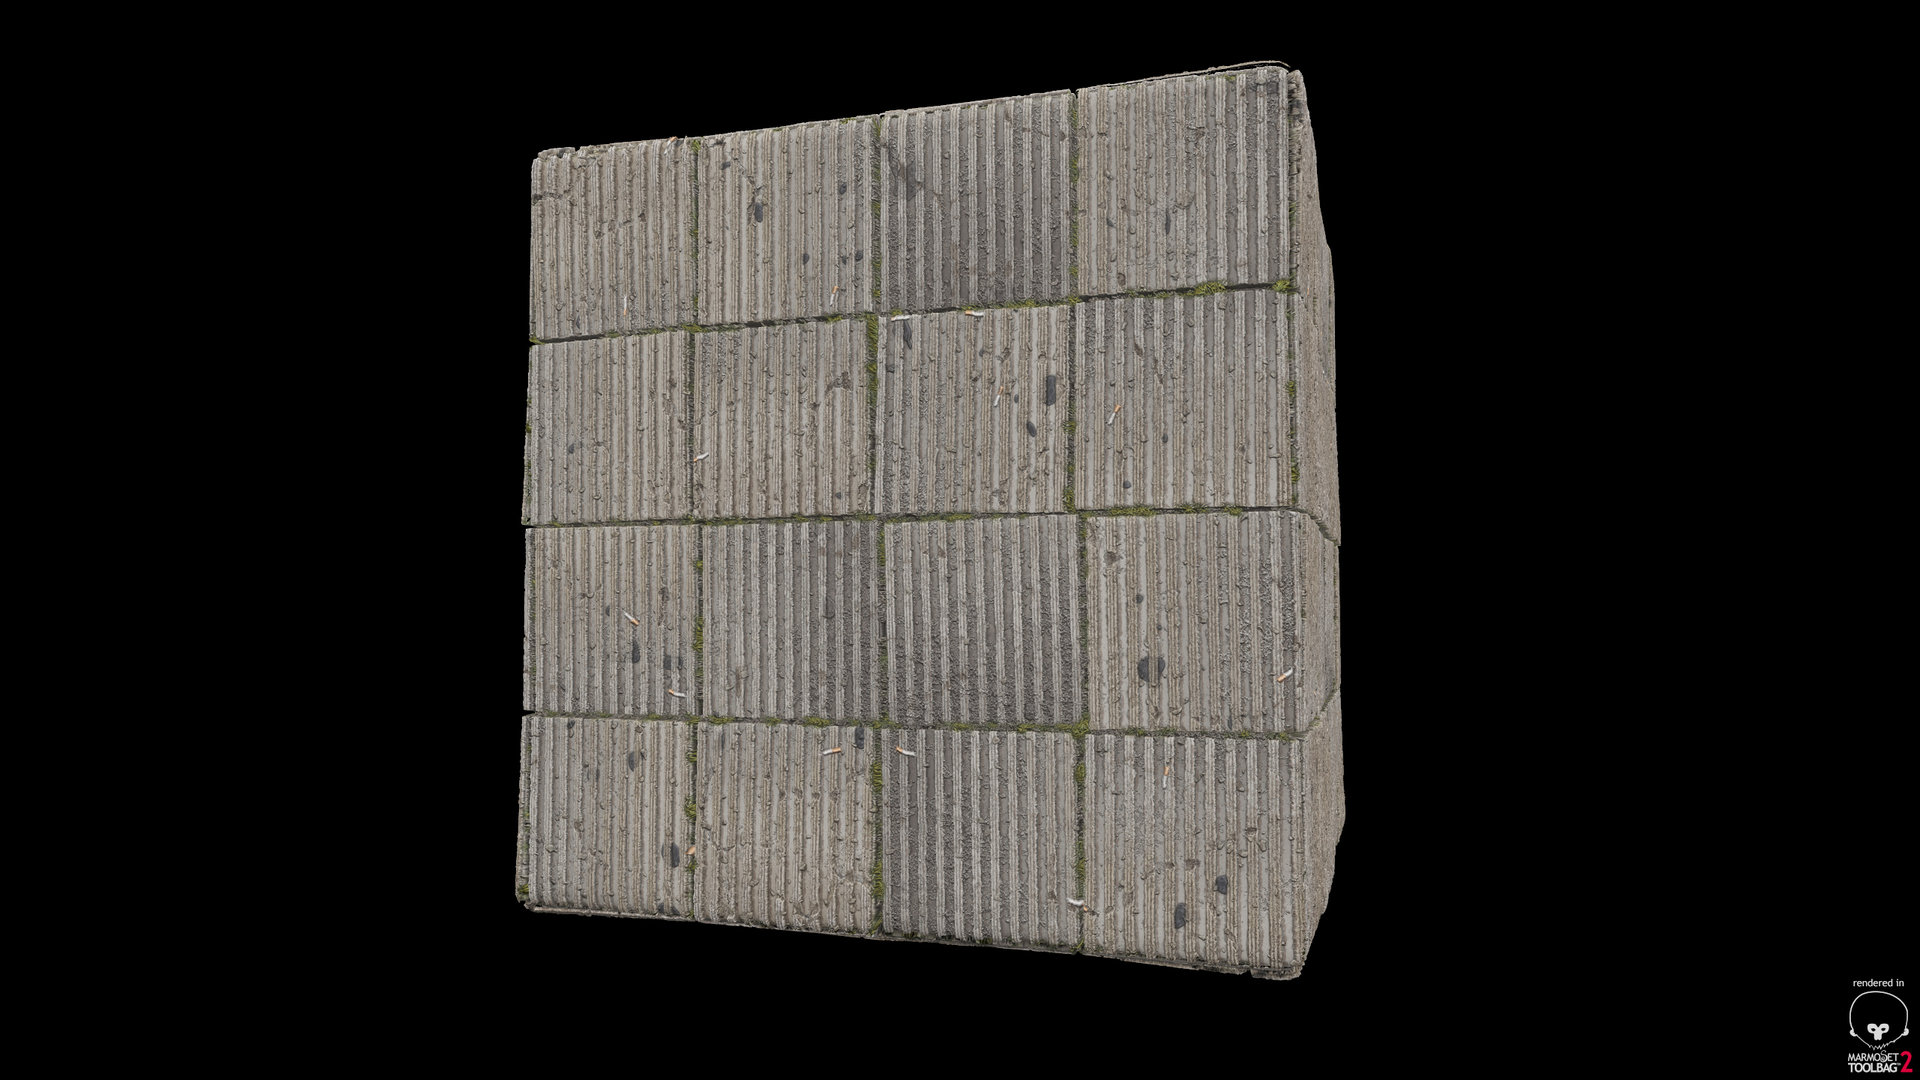 sebastian-schade-substance-tiles-1.jpg?1436971537